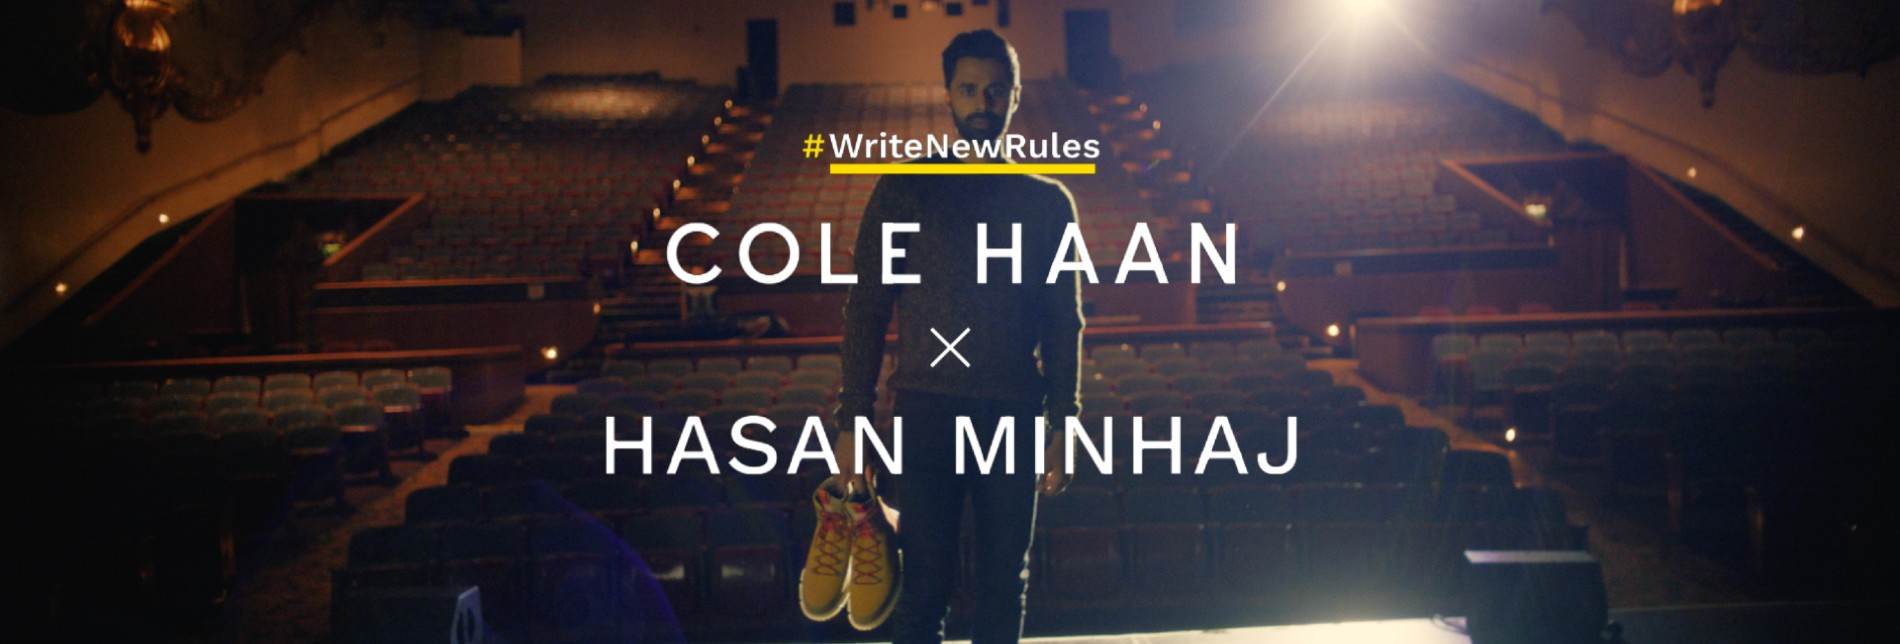 Cole Haan Announces Collaboration with Hasan Minhaj